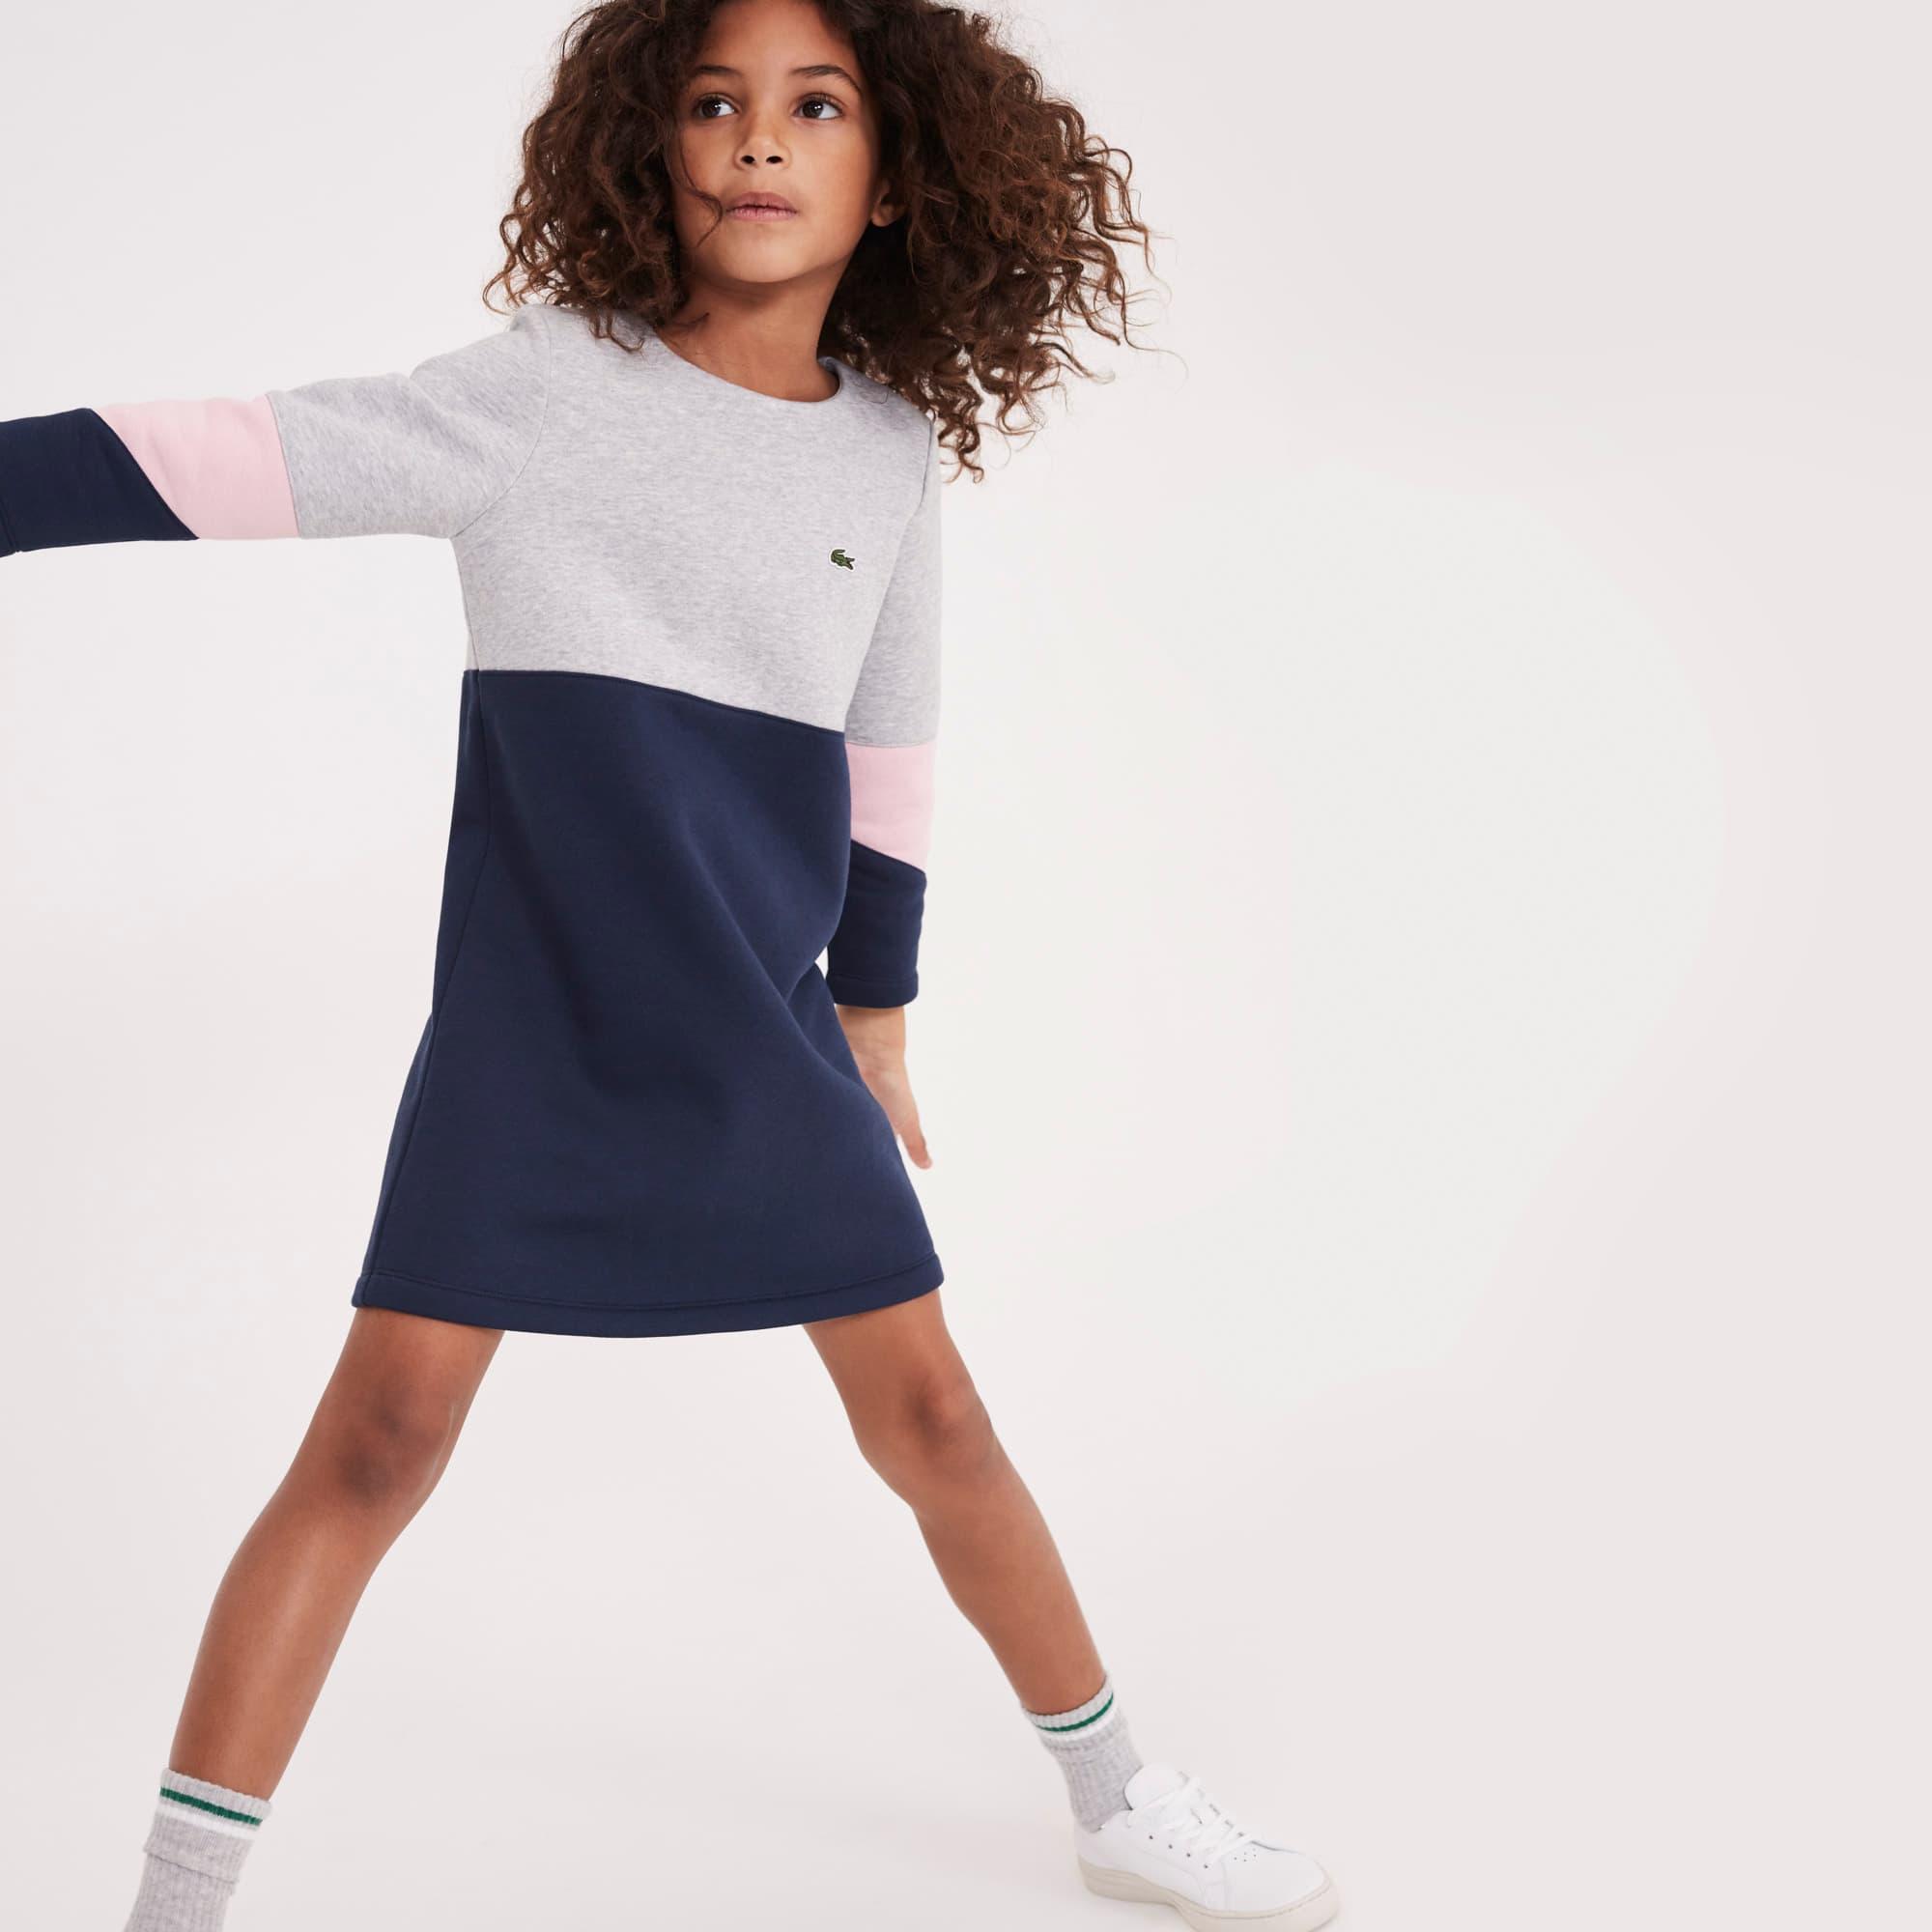 Mädchen Colorblock Kleid aus Fleece